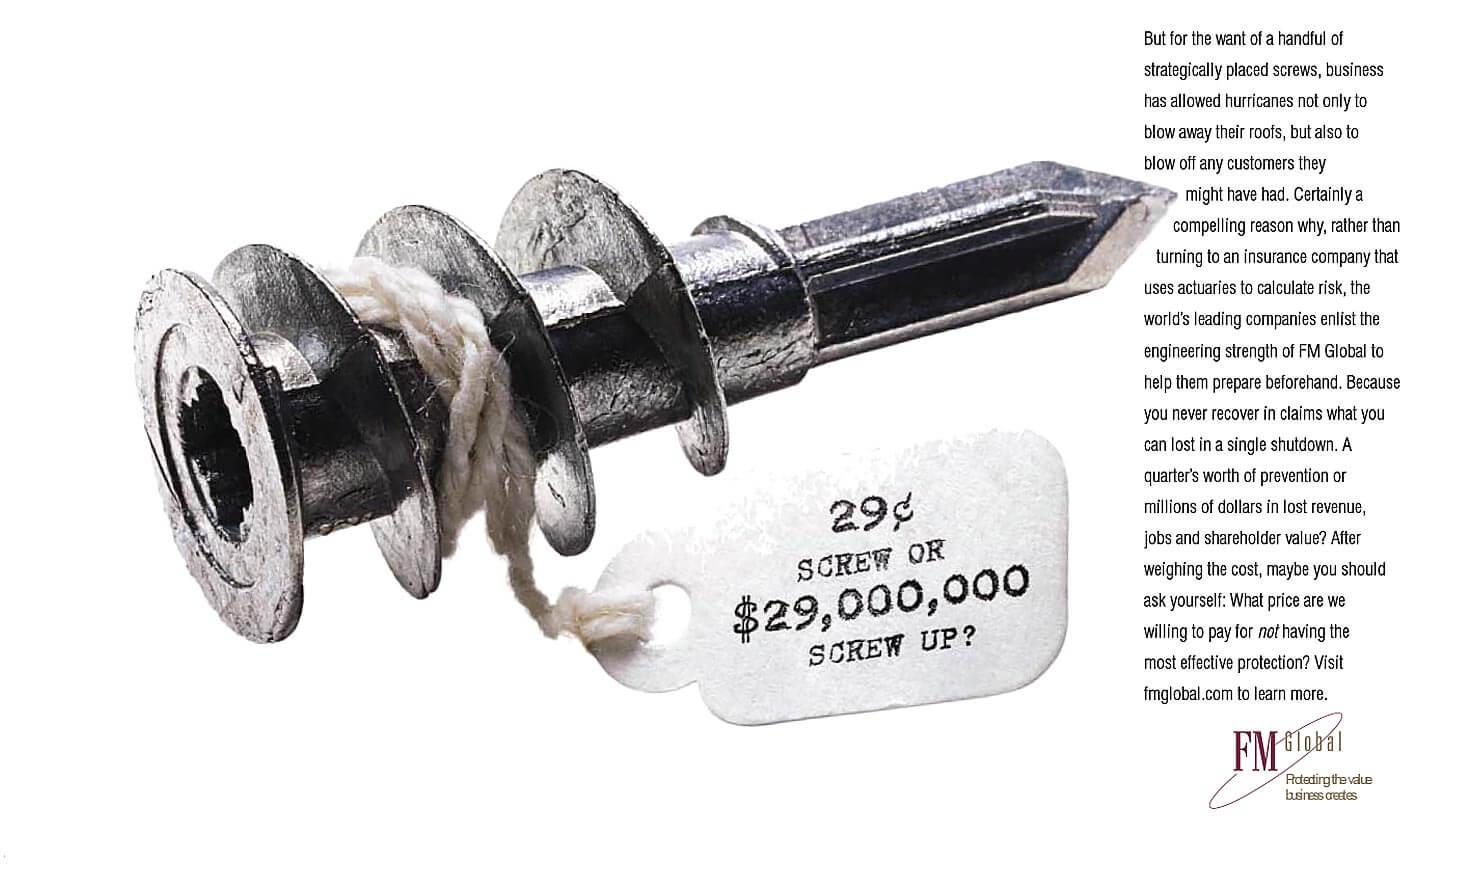 FMGlobal. $45 bung. Or $45,000,000 bungle?